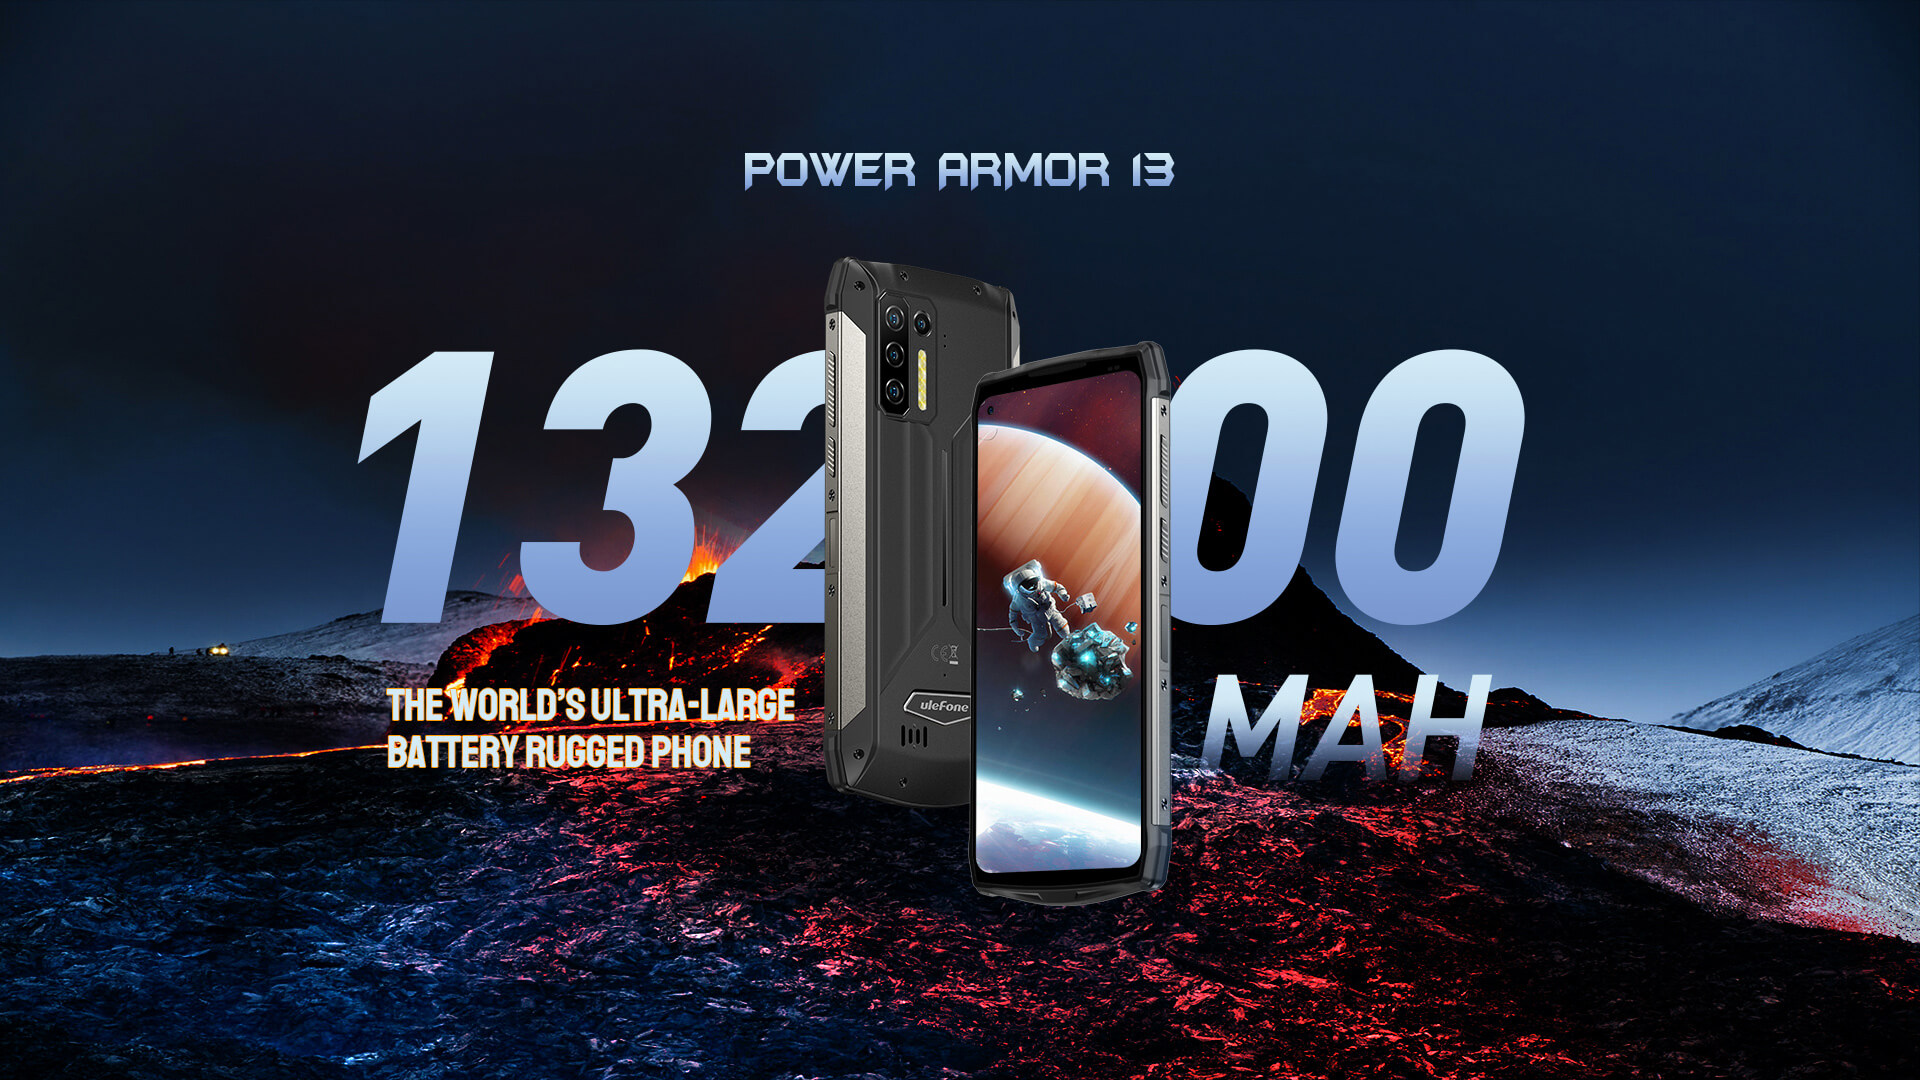 powerarmor13-bg-1.jpg